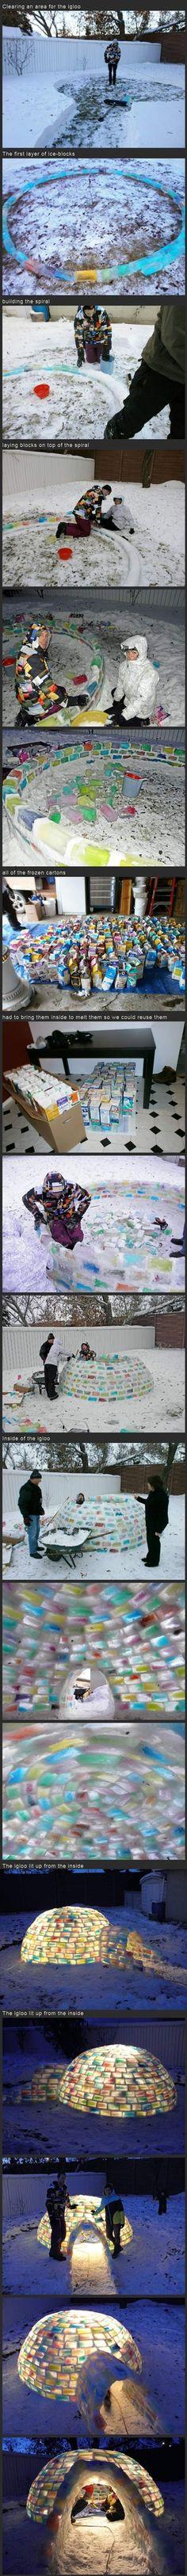 Coloured ice igloo